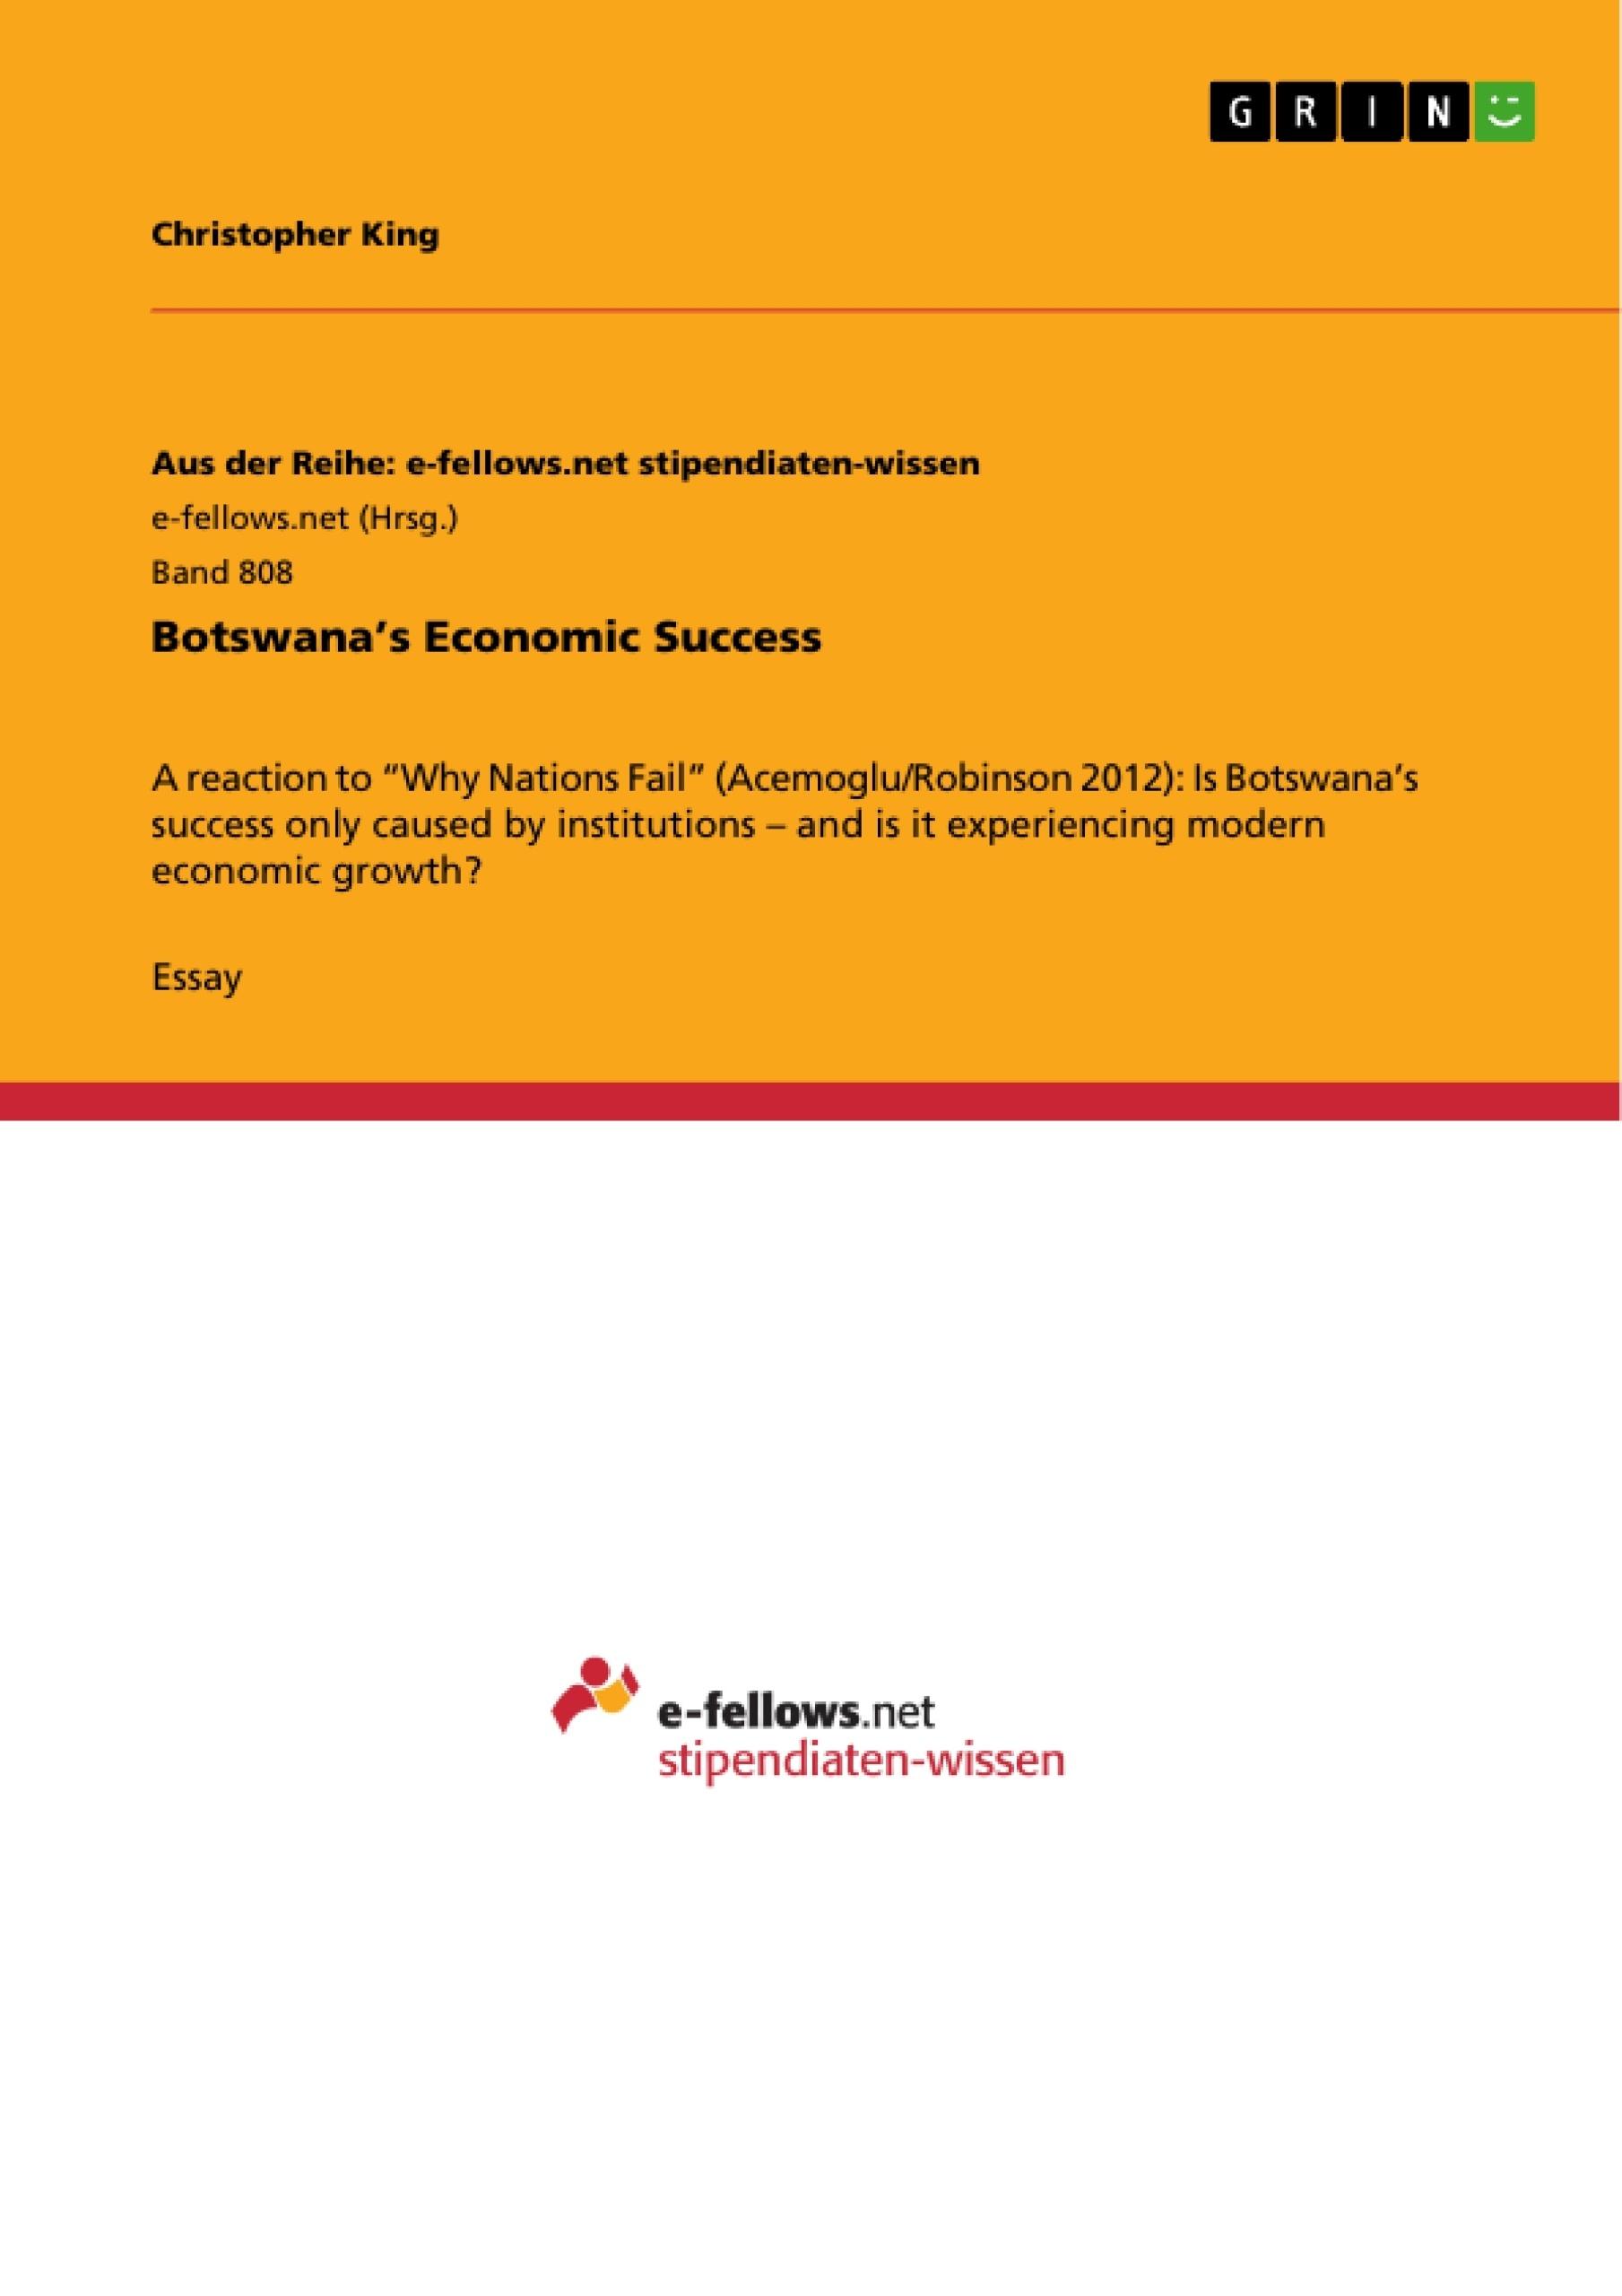 Title: Botswana's Economic Success